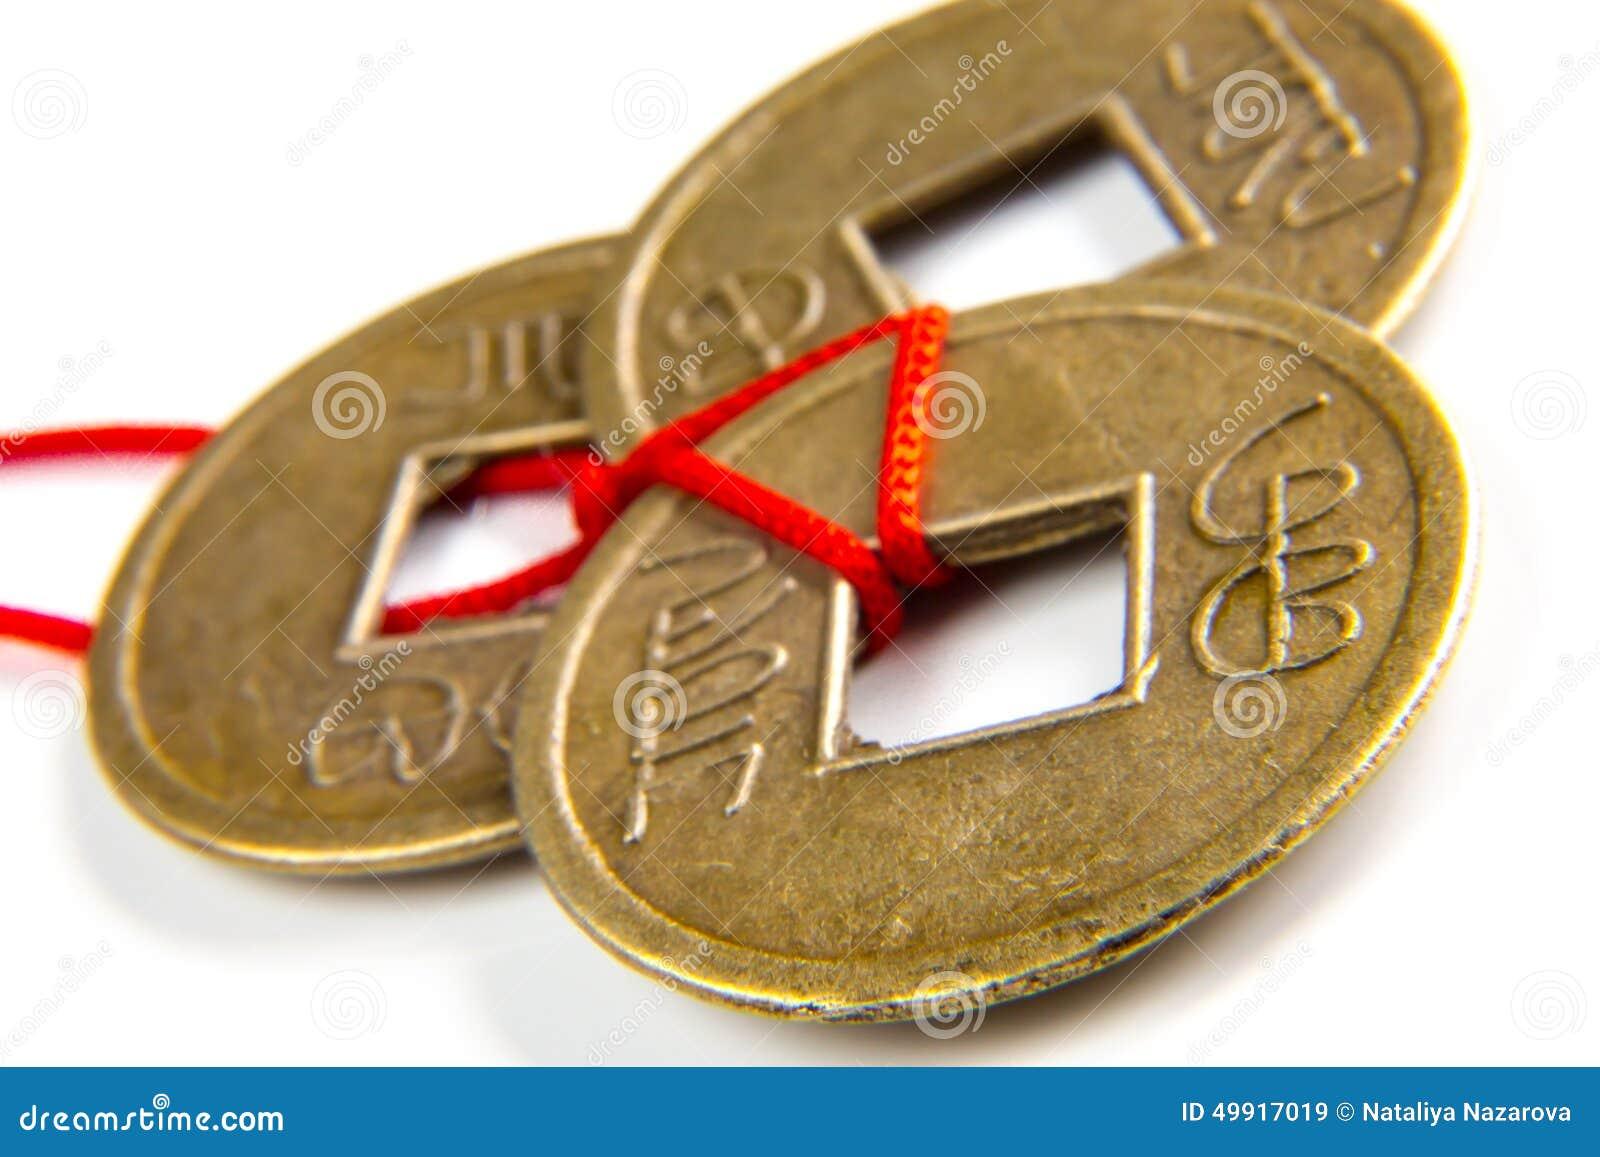 Feng shui lucky coins stock photo image 49917019 - Feng shui good luck coins ...